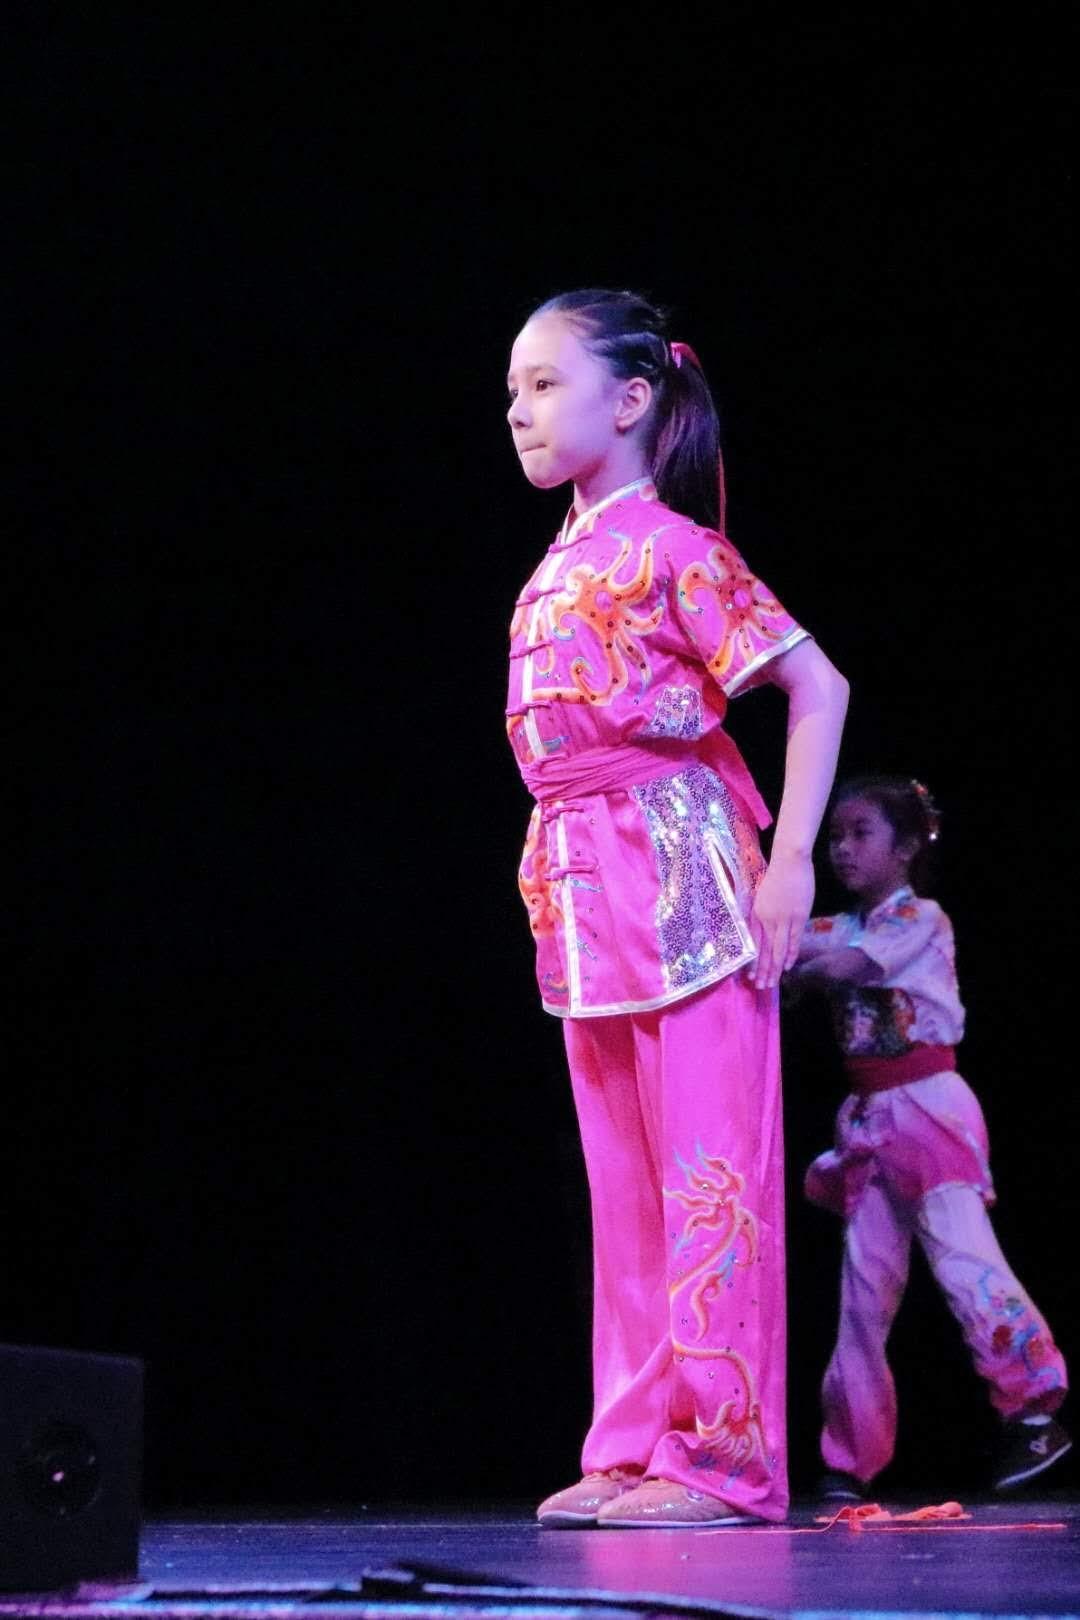 wayland-li-wushu-children-spring-fesitval-toronto-canada-2019-12.jpg